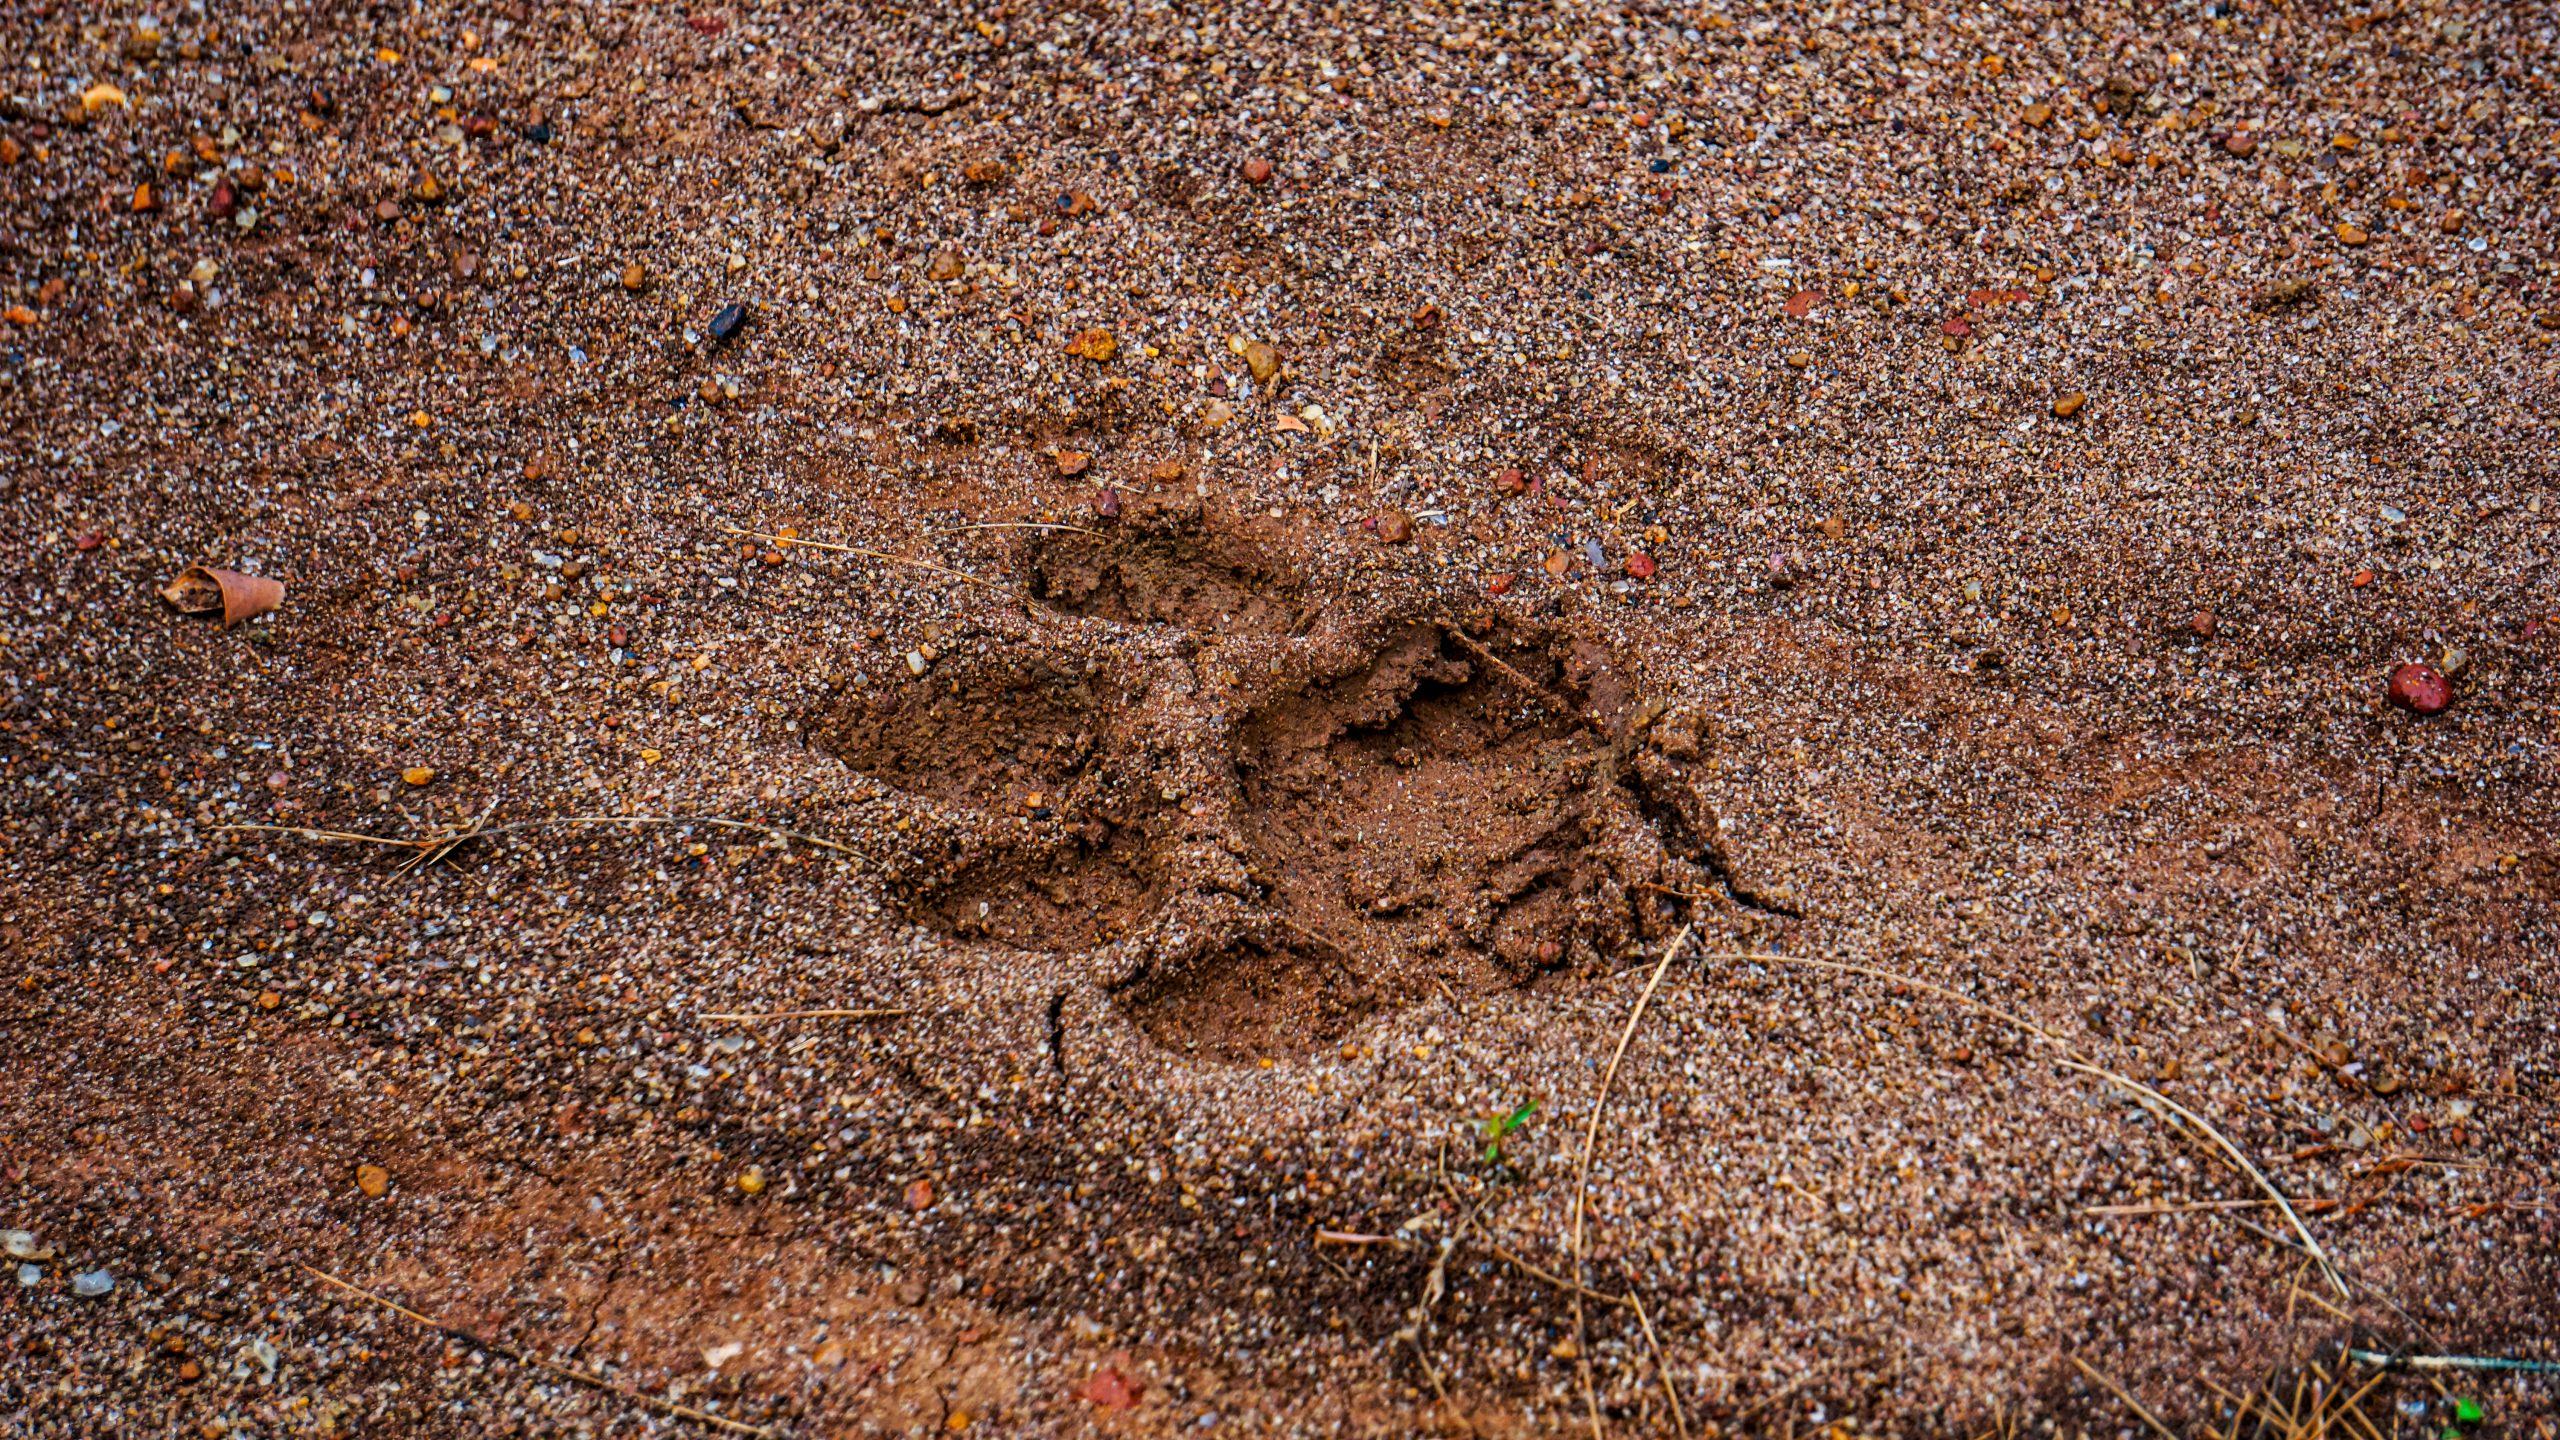 A tiger's footprint